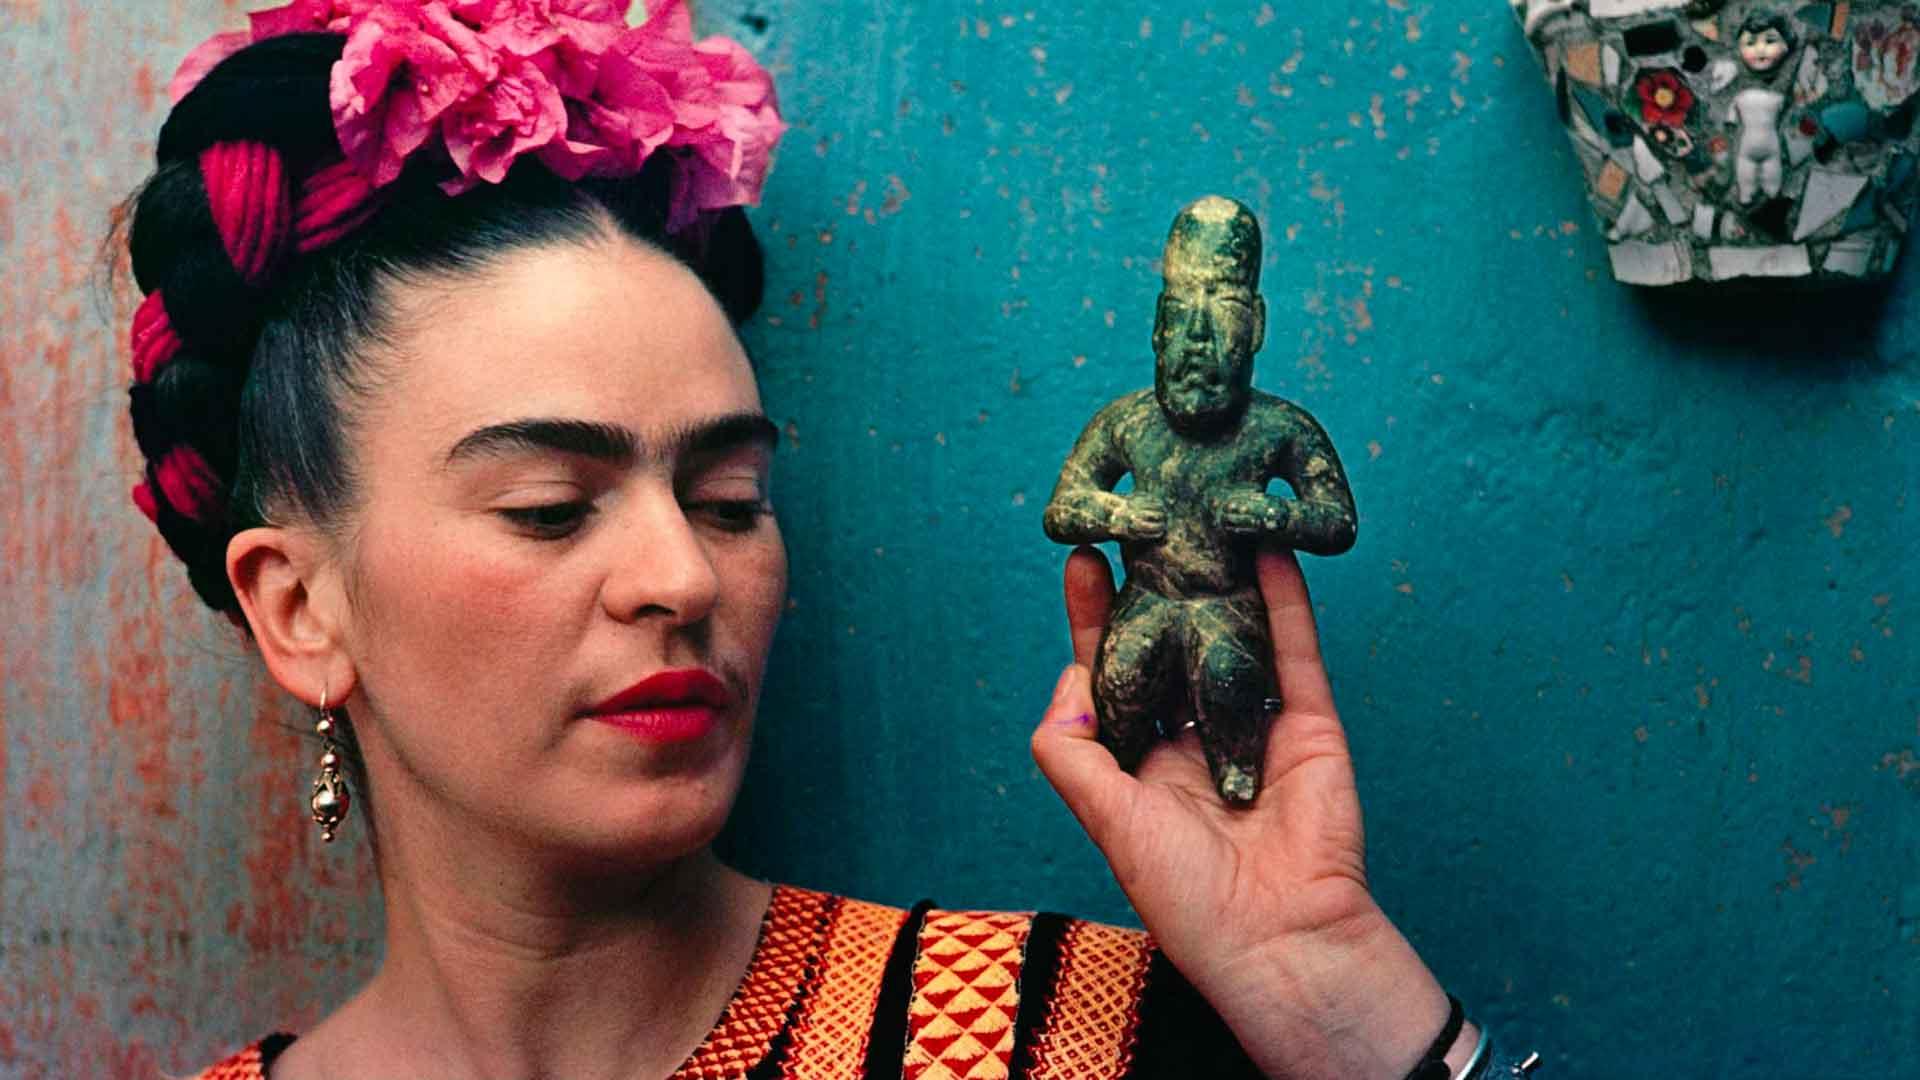 Frida's Wardrobe hero asset